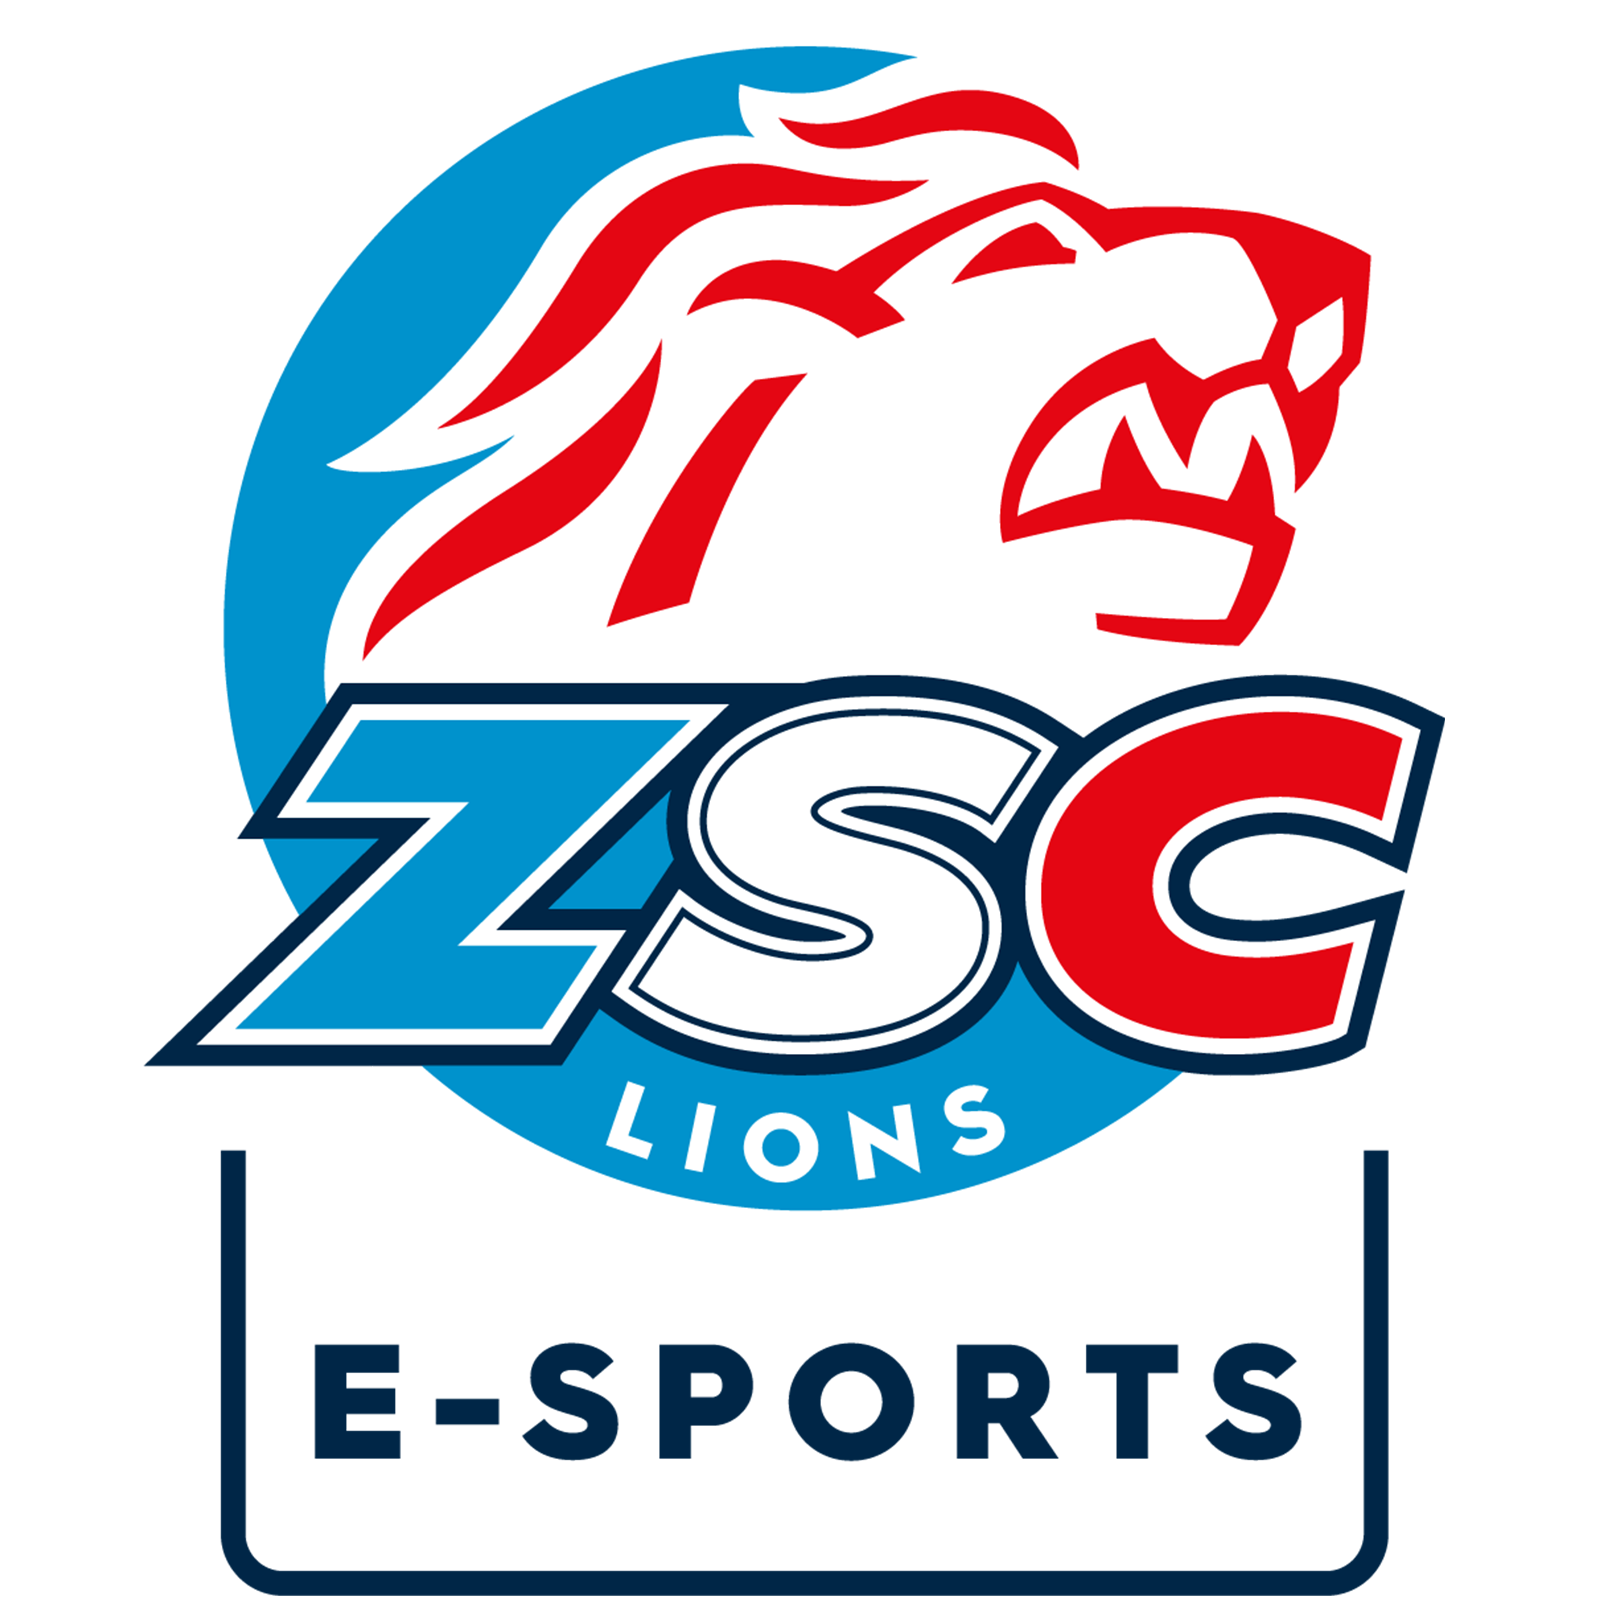 ZSC Esports